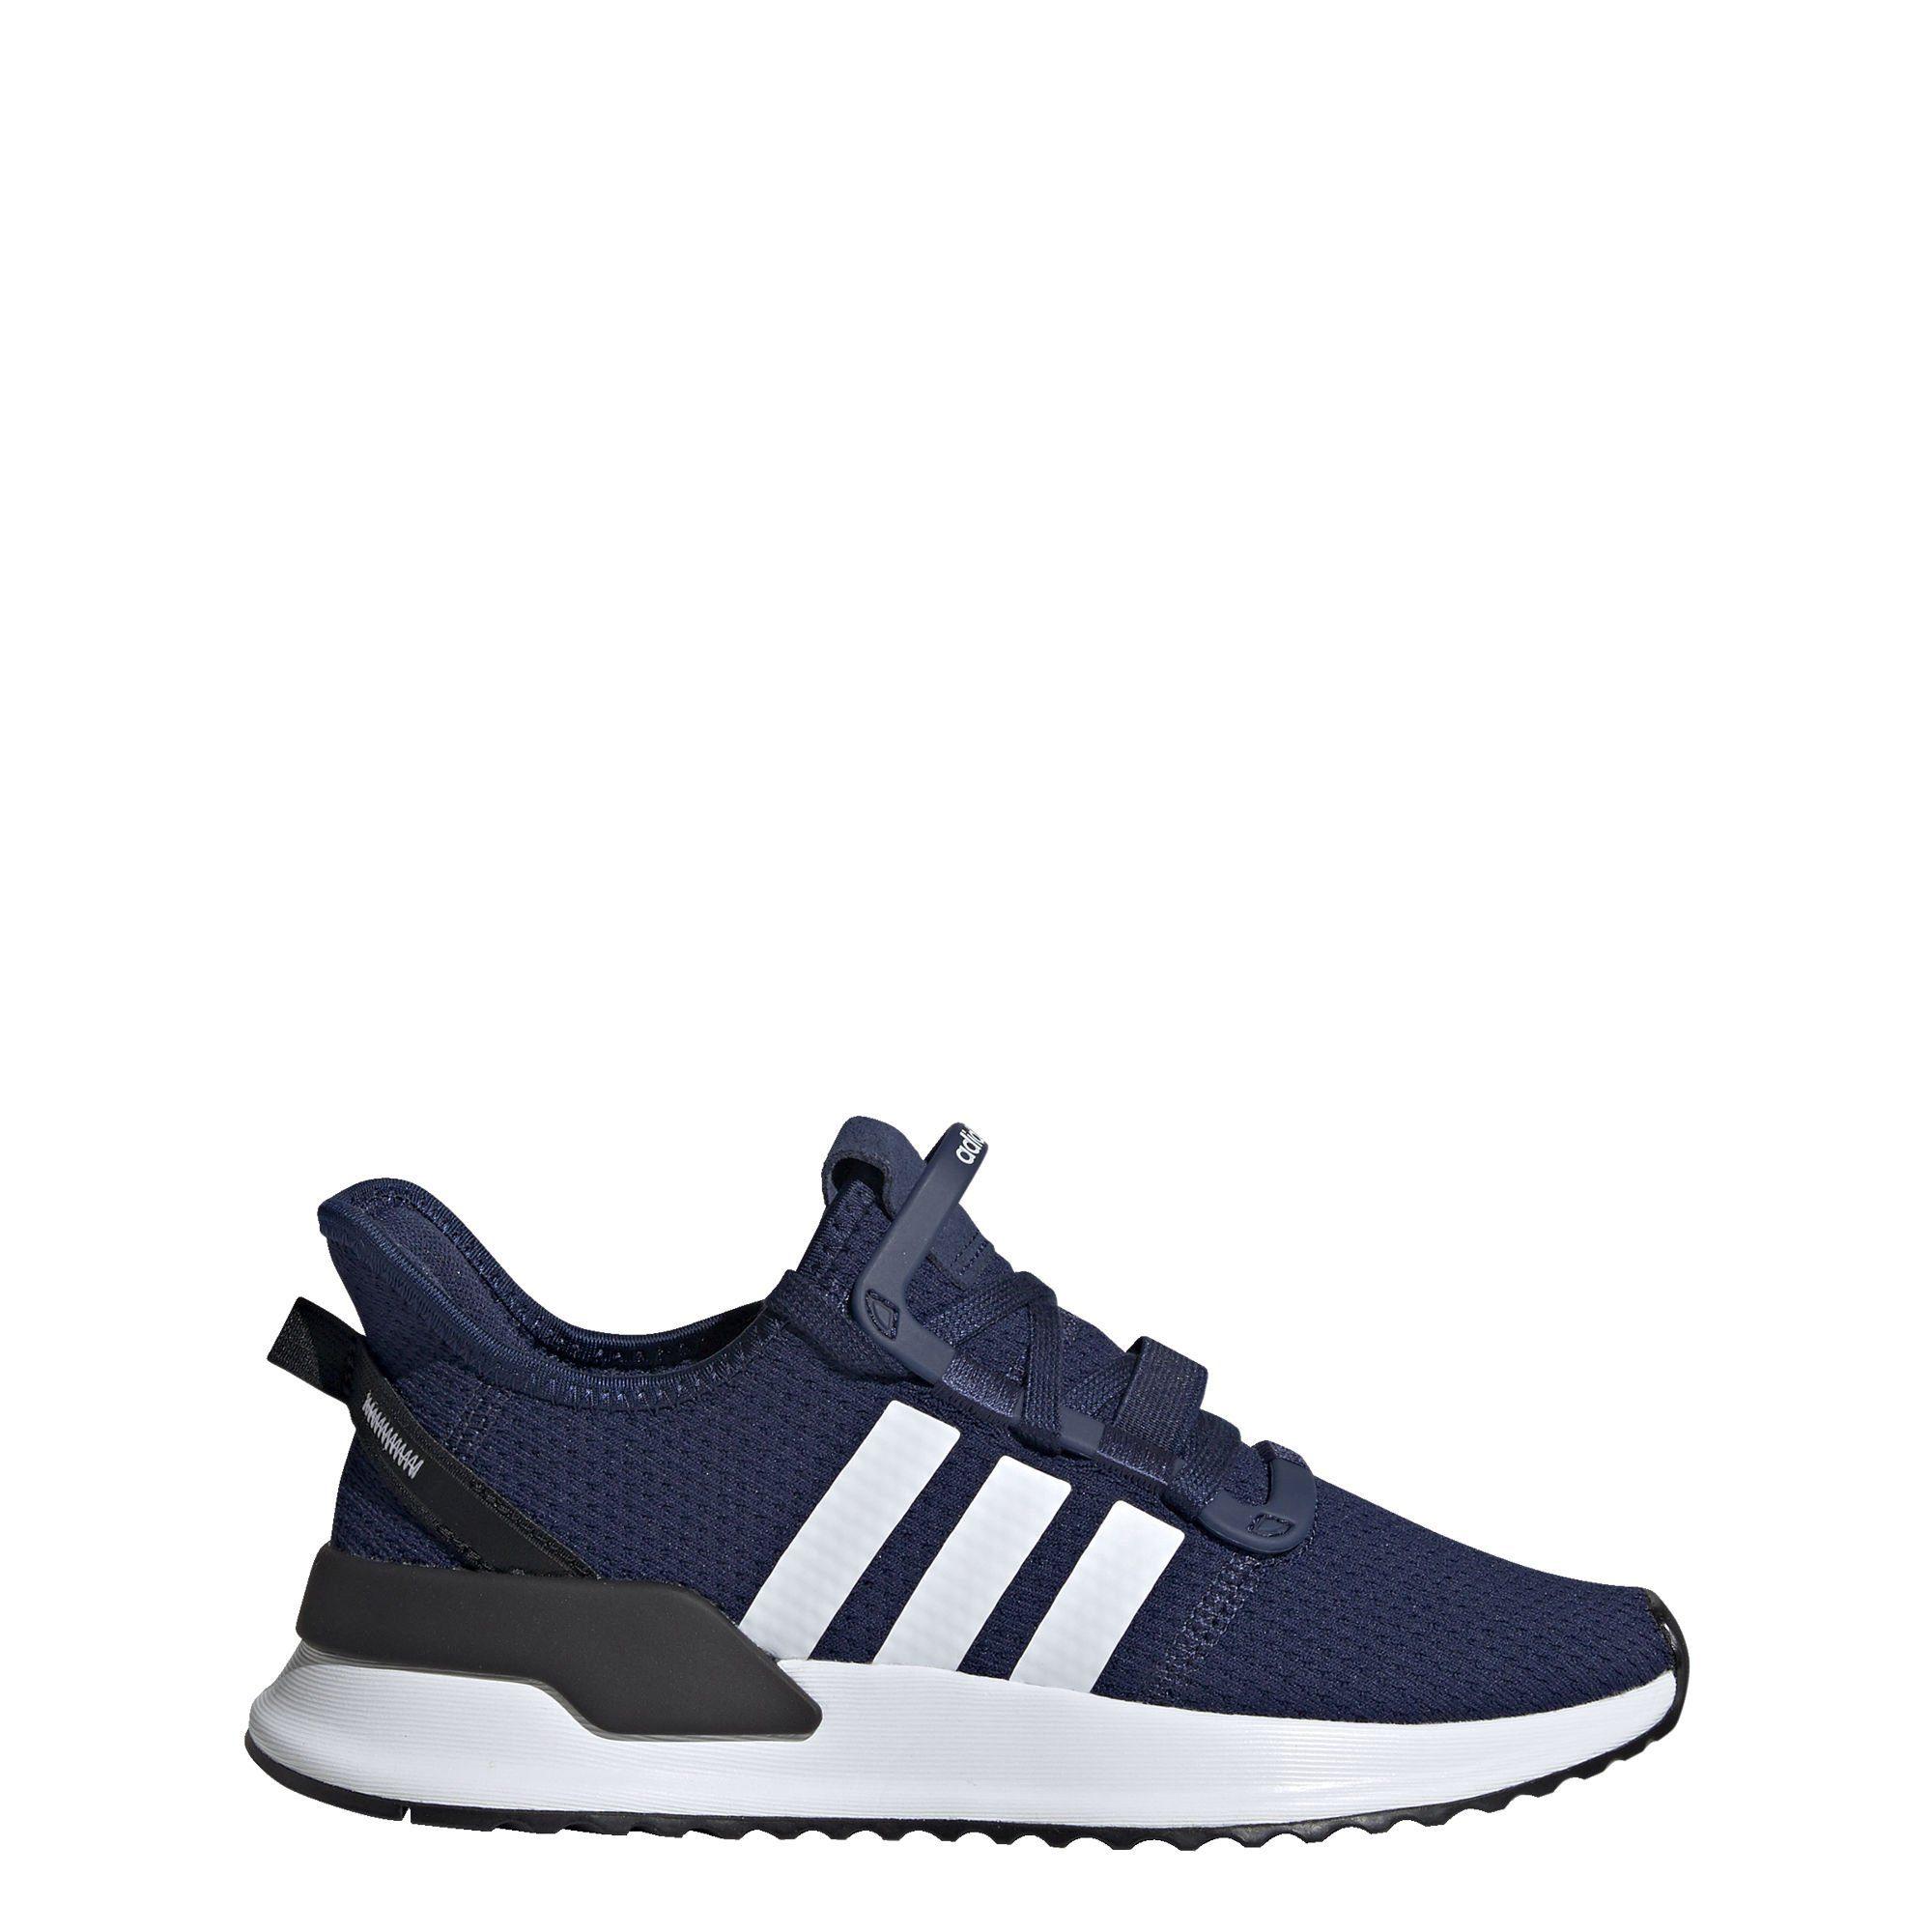 »u Laufschuh Adidas path Online Schuh« path U Originals KaufenOtto Run XkN8nO0wZP